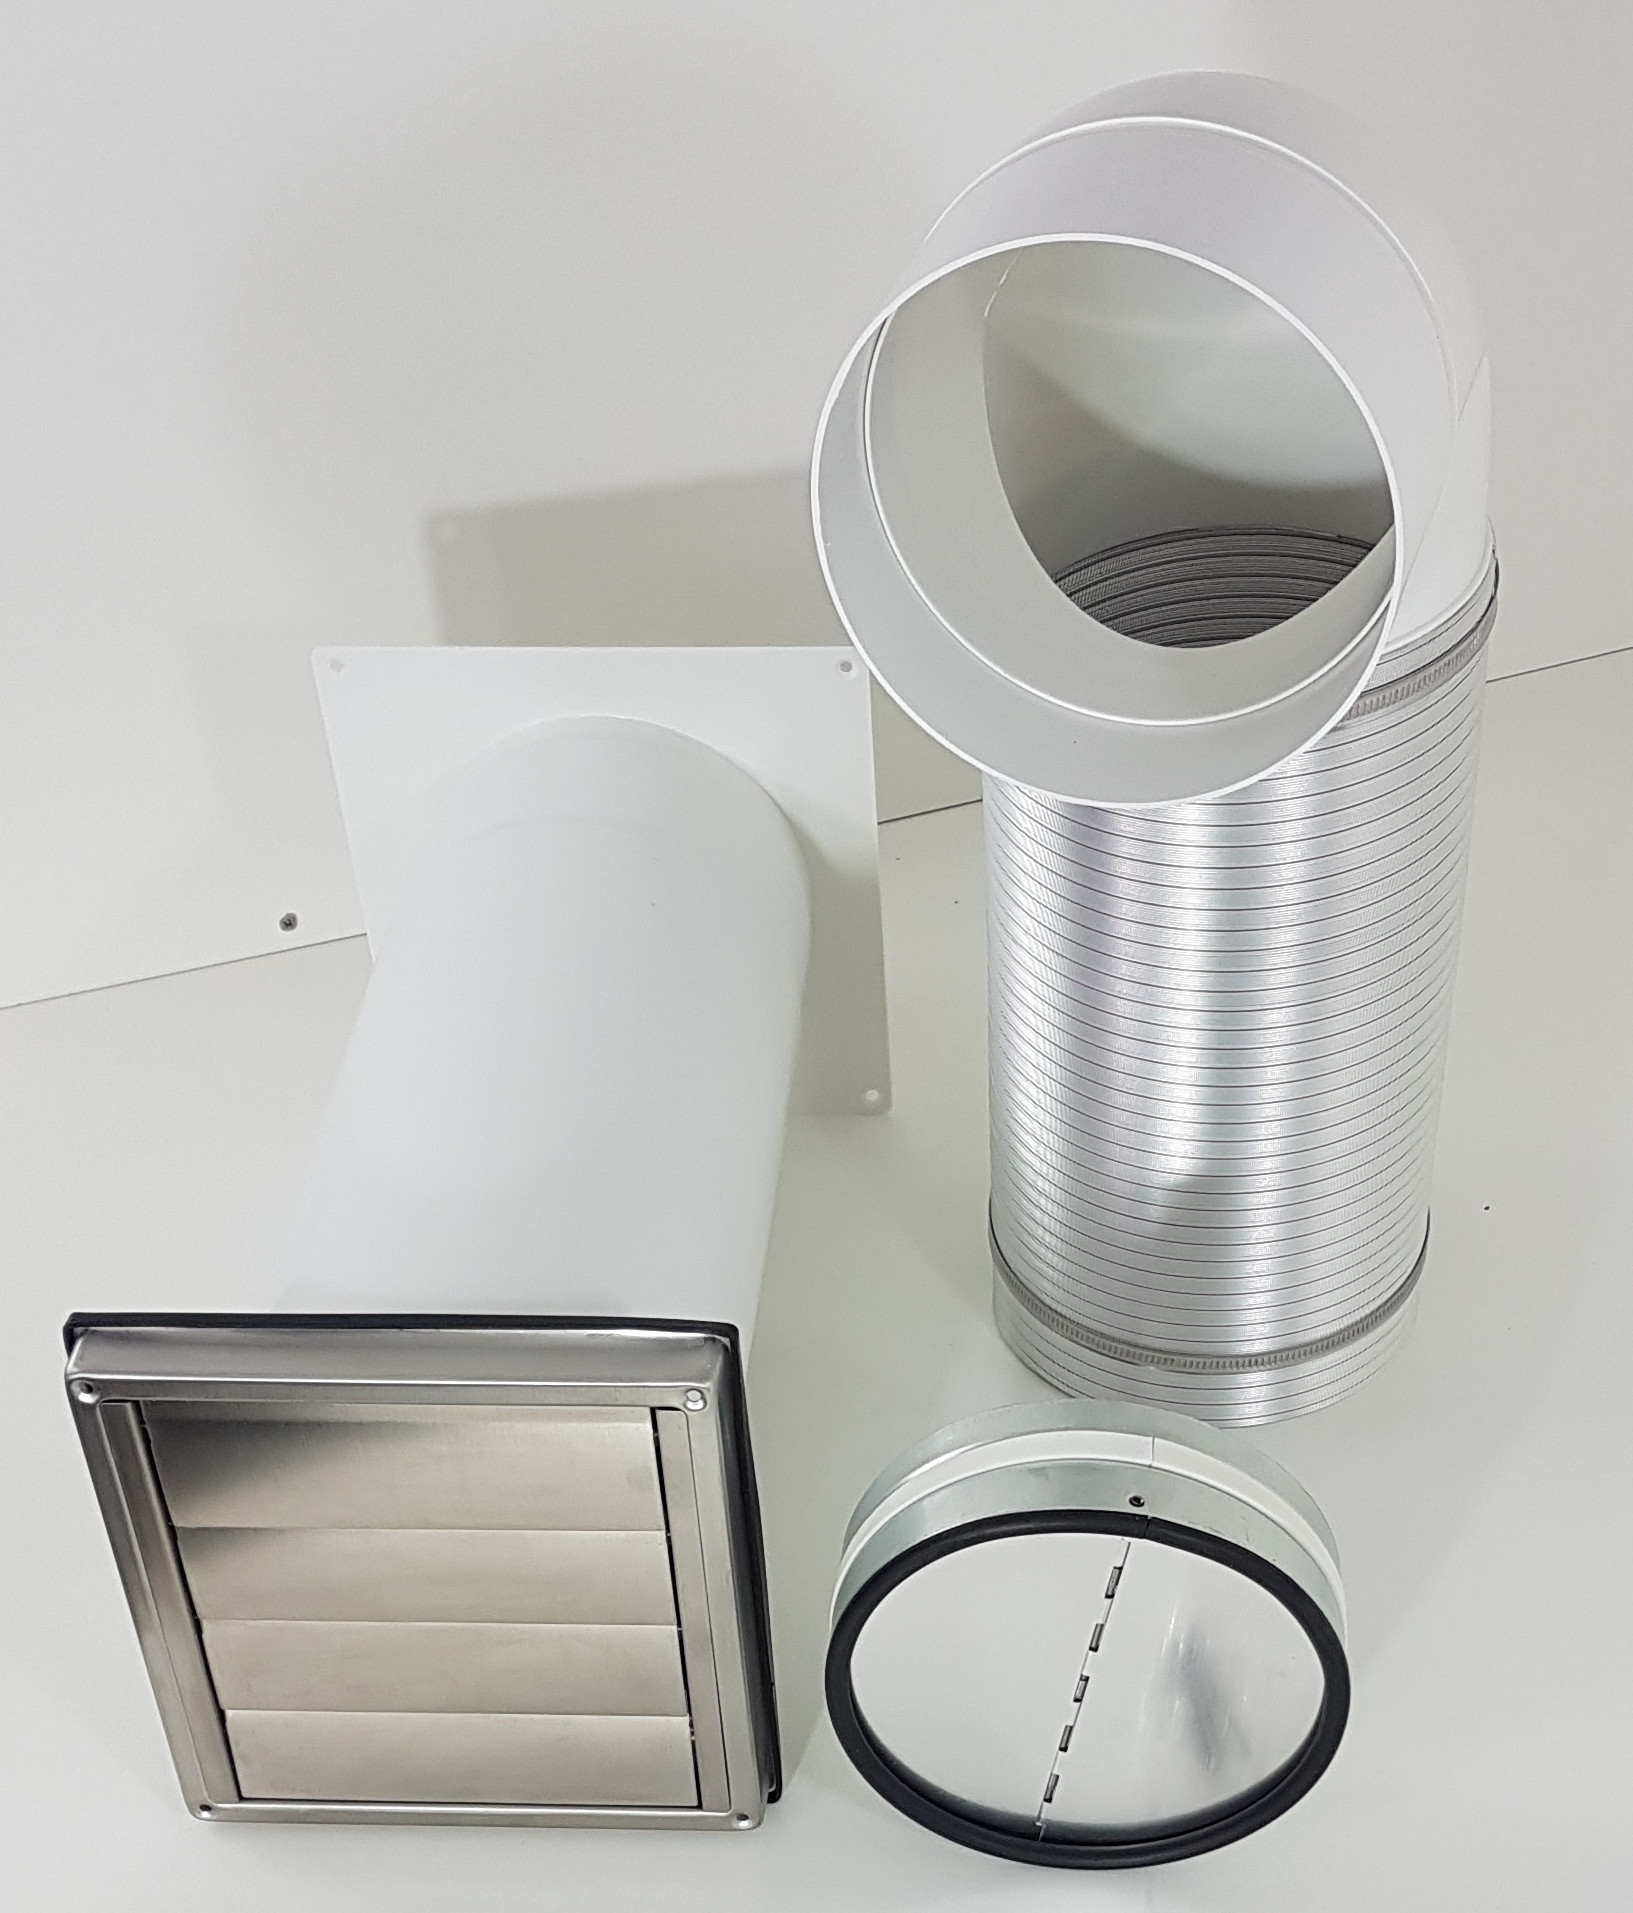 Mauerkasten Dunstabzug 150 Rückstauklappe Rückschlagklappe Edelstahl Teleskoprohr Rohr Set